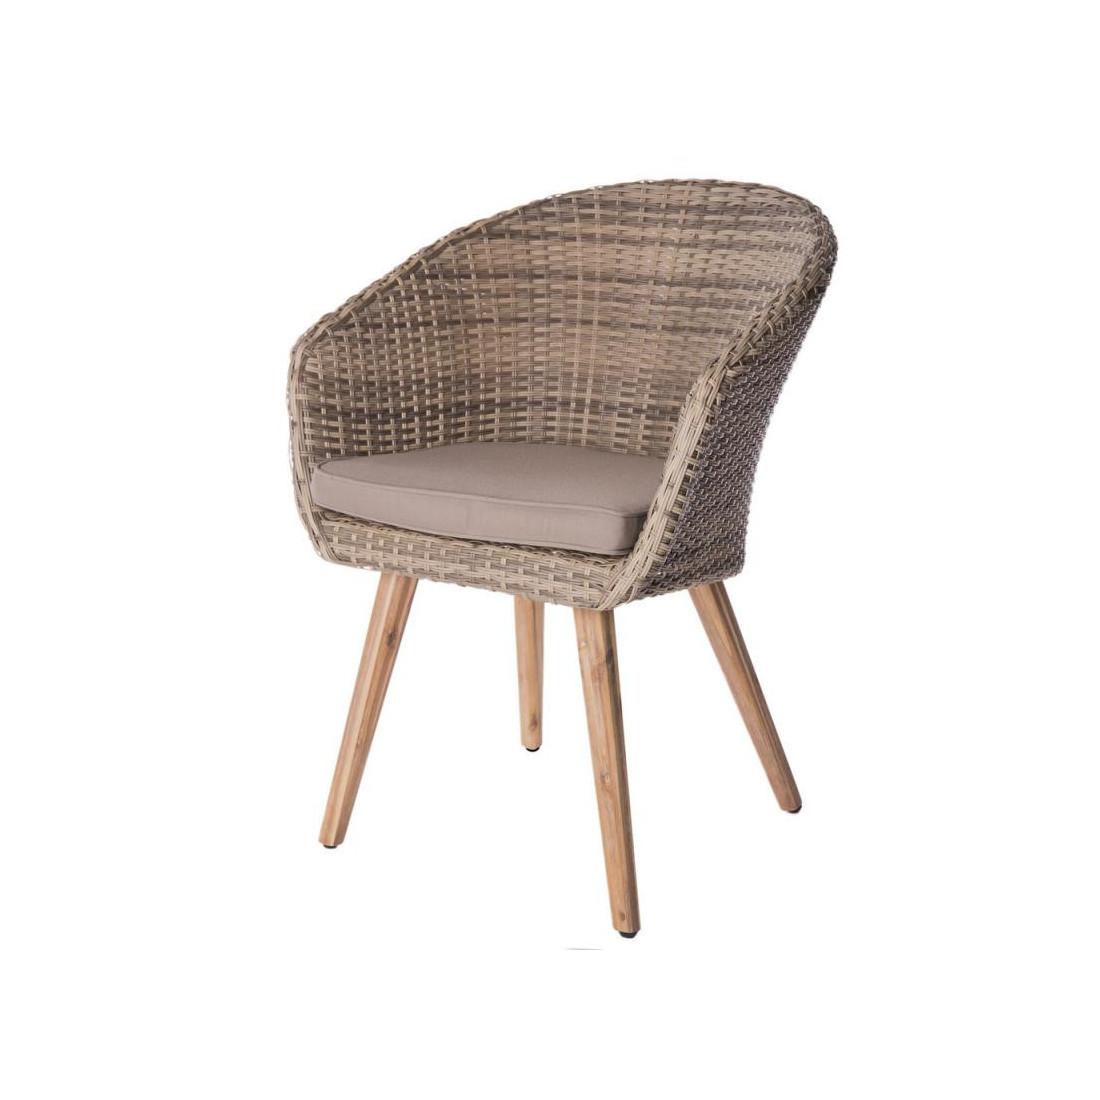 ensemble table ronde chaises bois rotin huraa univers. Black Bedroom Furniture Sets. Home Design Ideas